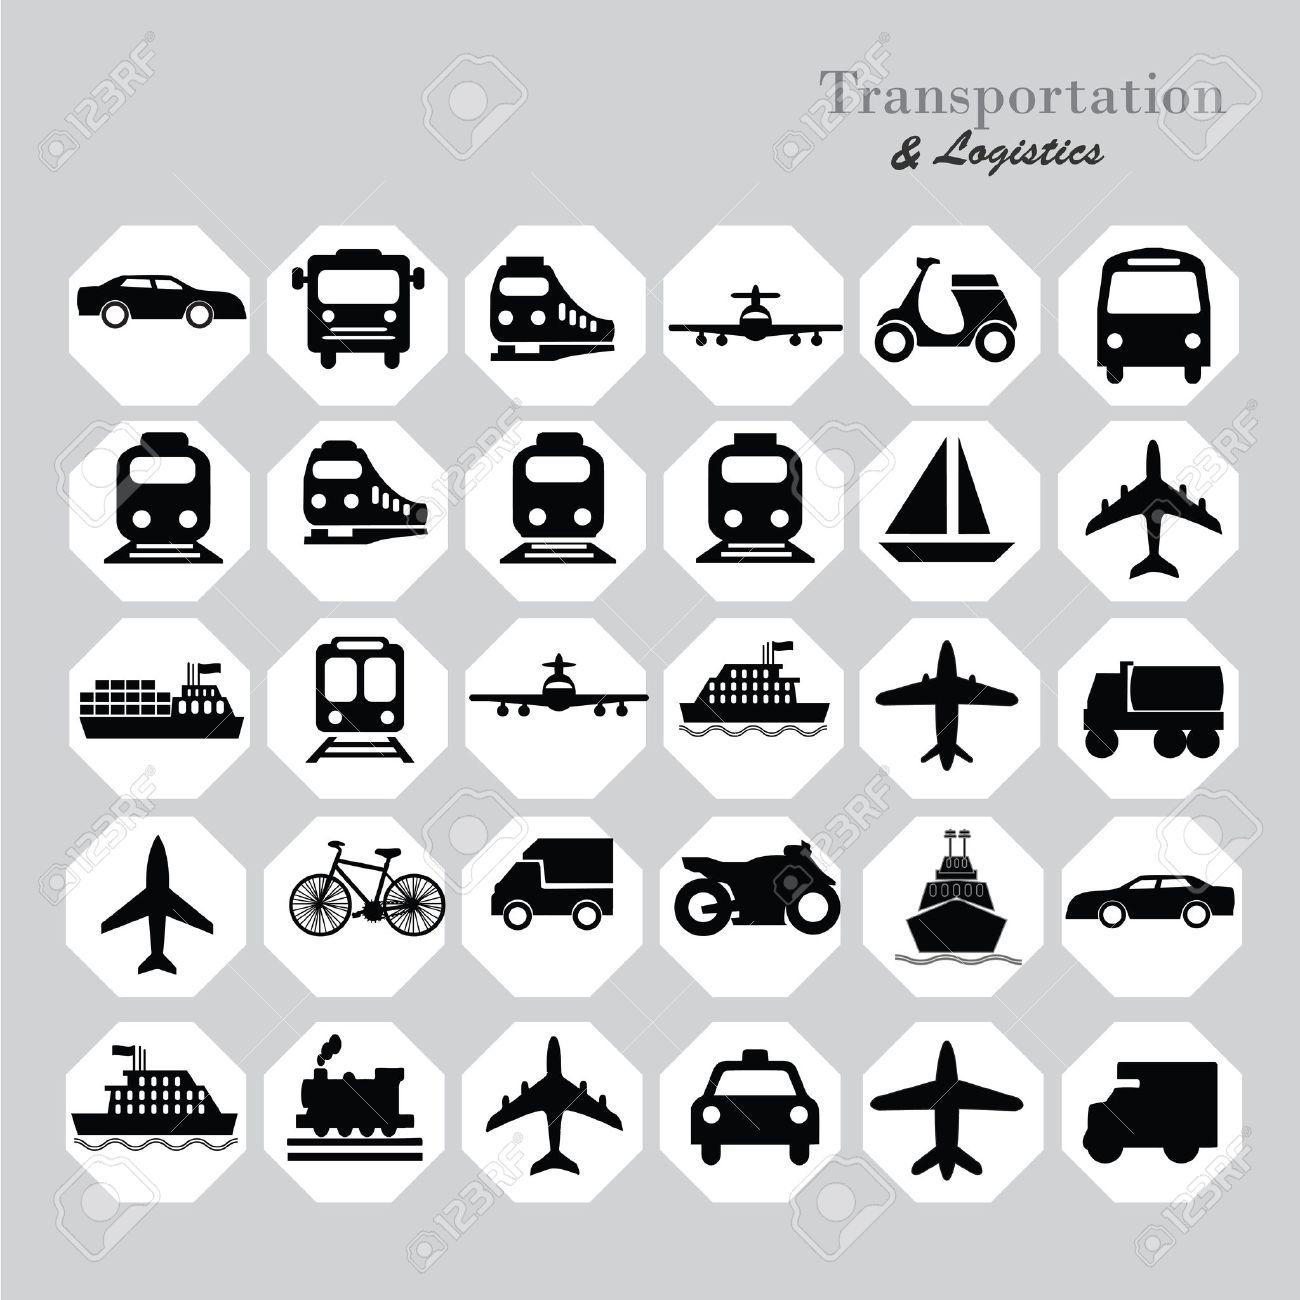 Transport icons.transportation .logistics.logistic icon.vector illustration. - 43527904